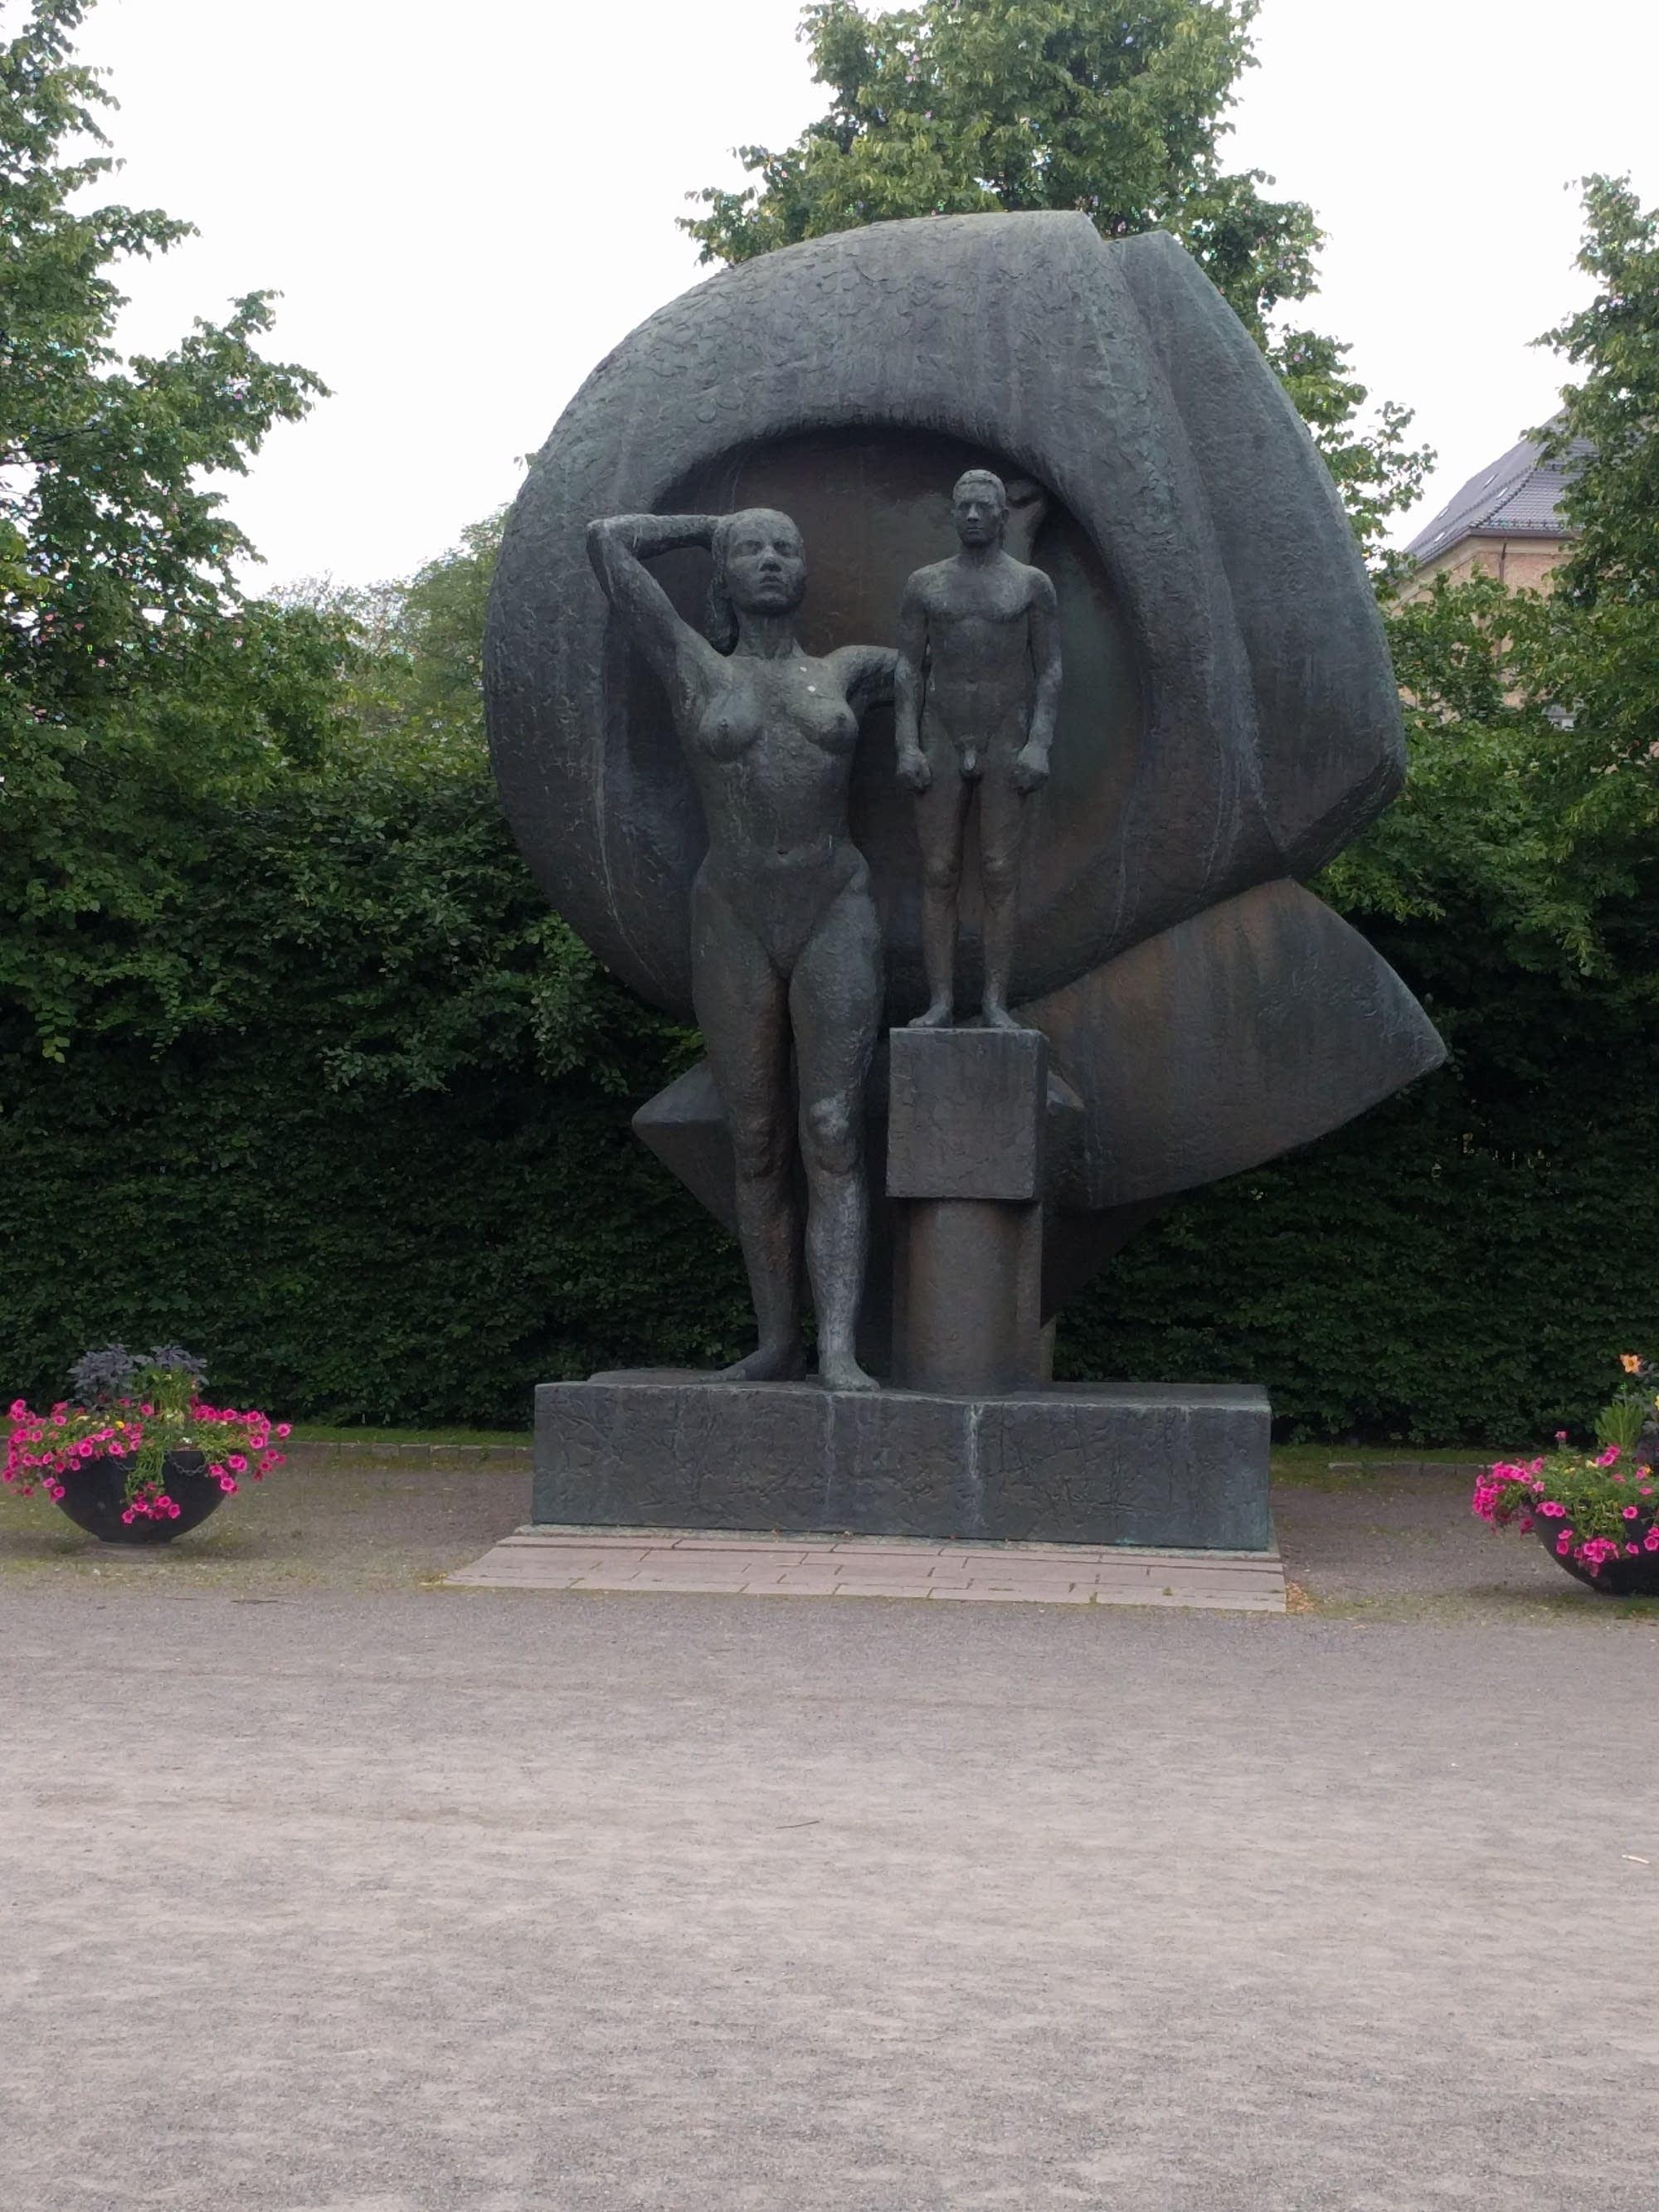 Oslo - 04 - sculpture park 1